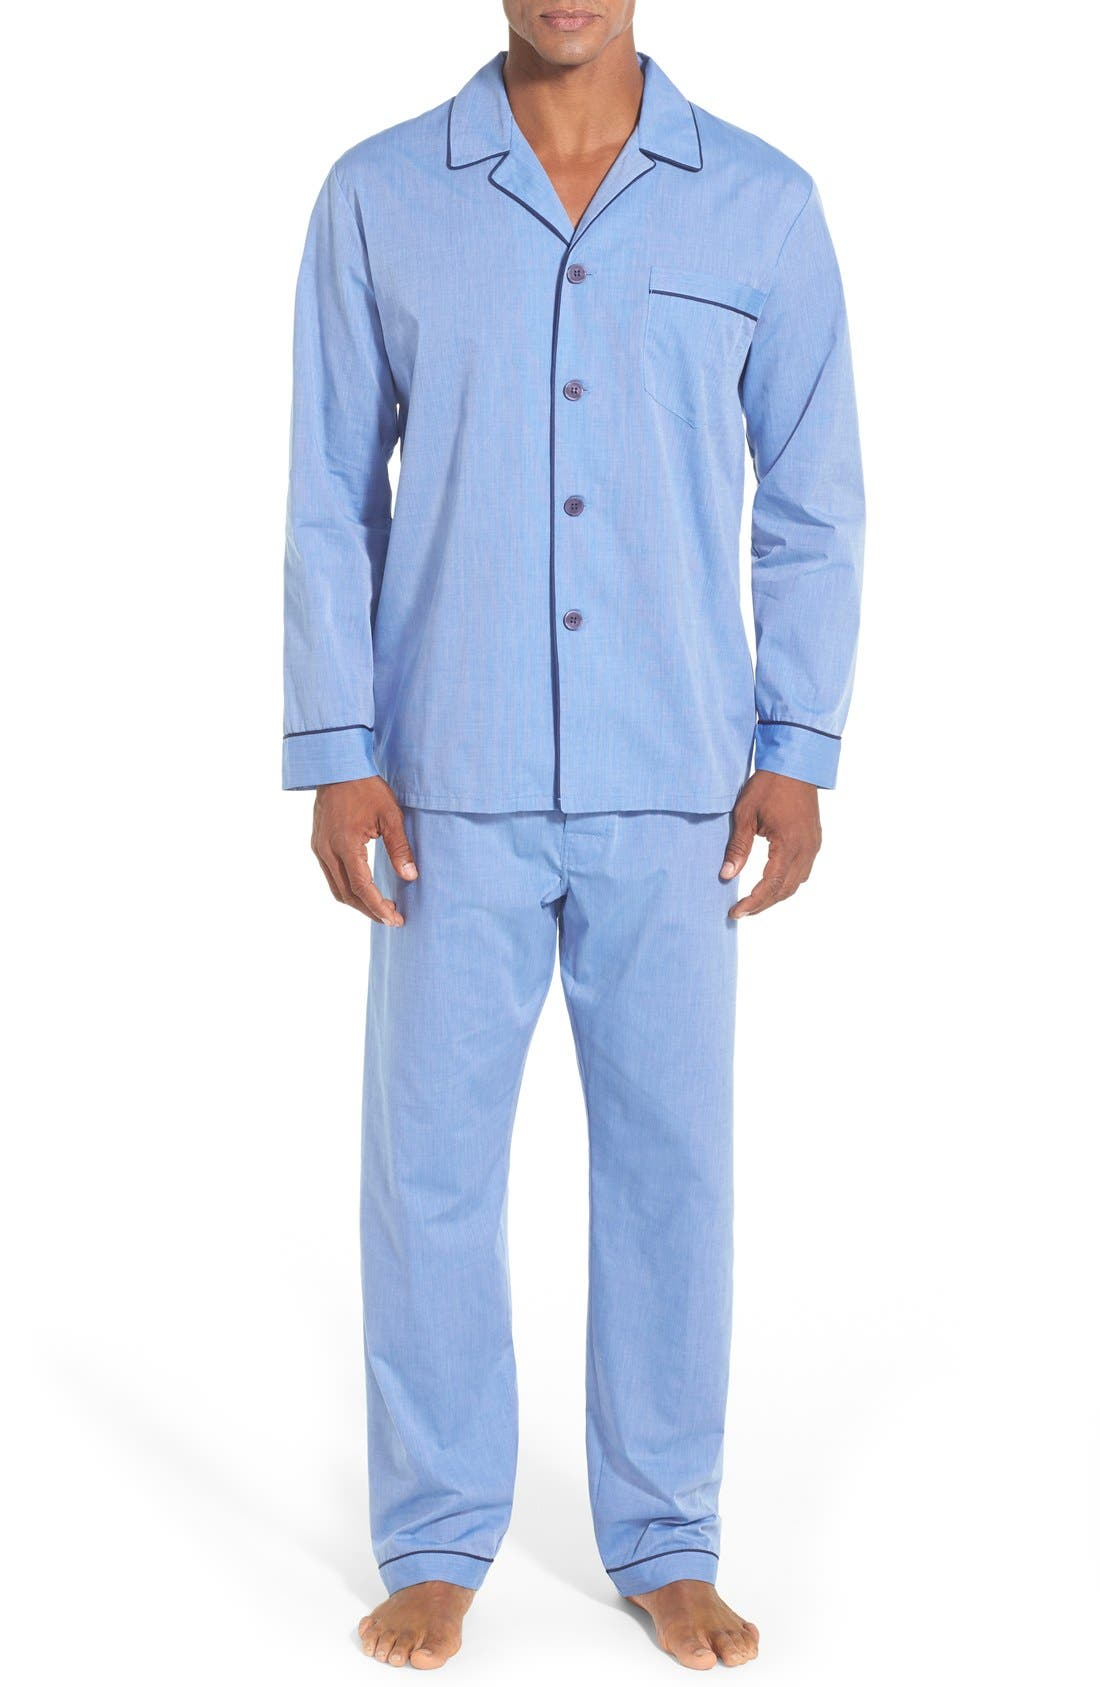 Cotton Blend Pajamas,                             Main thumbnail 1, color,                             421